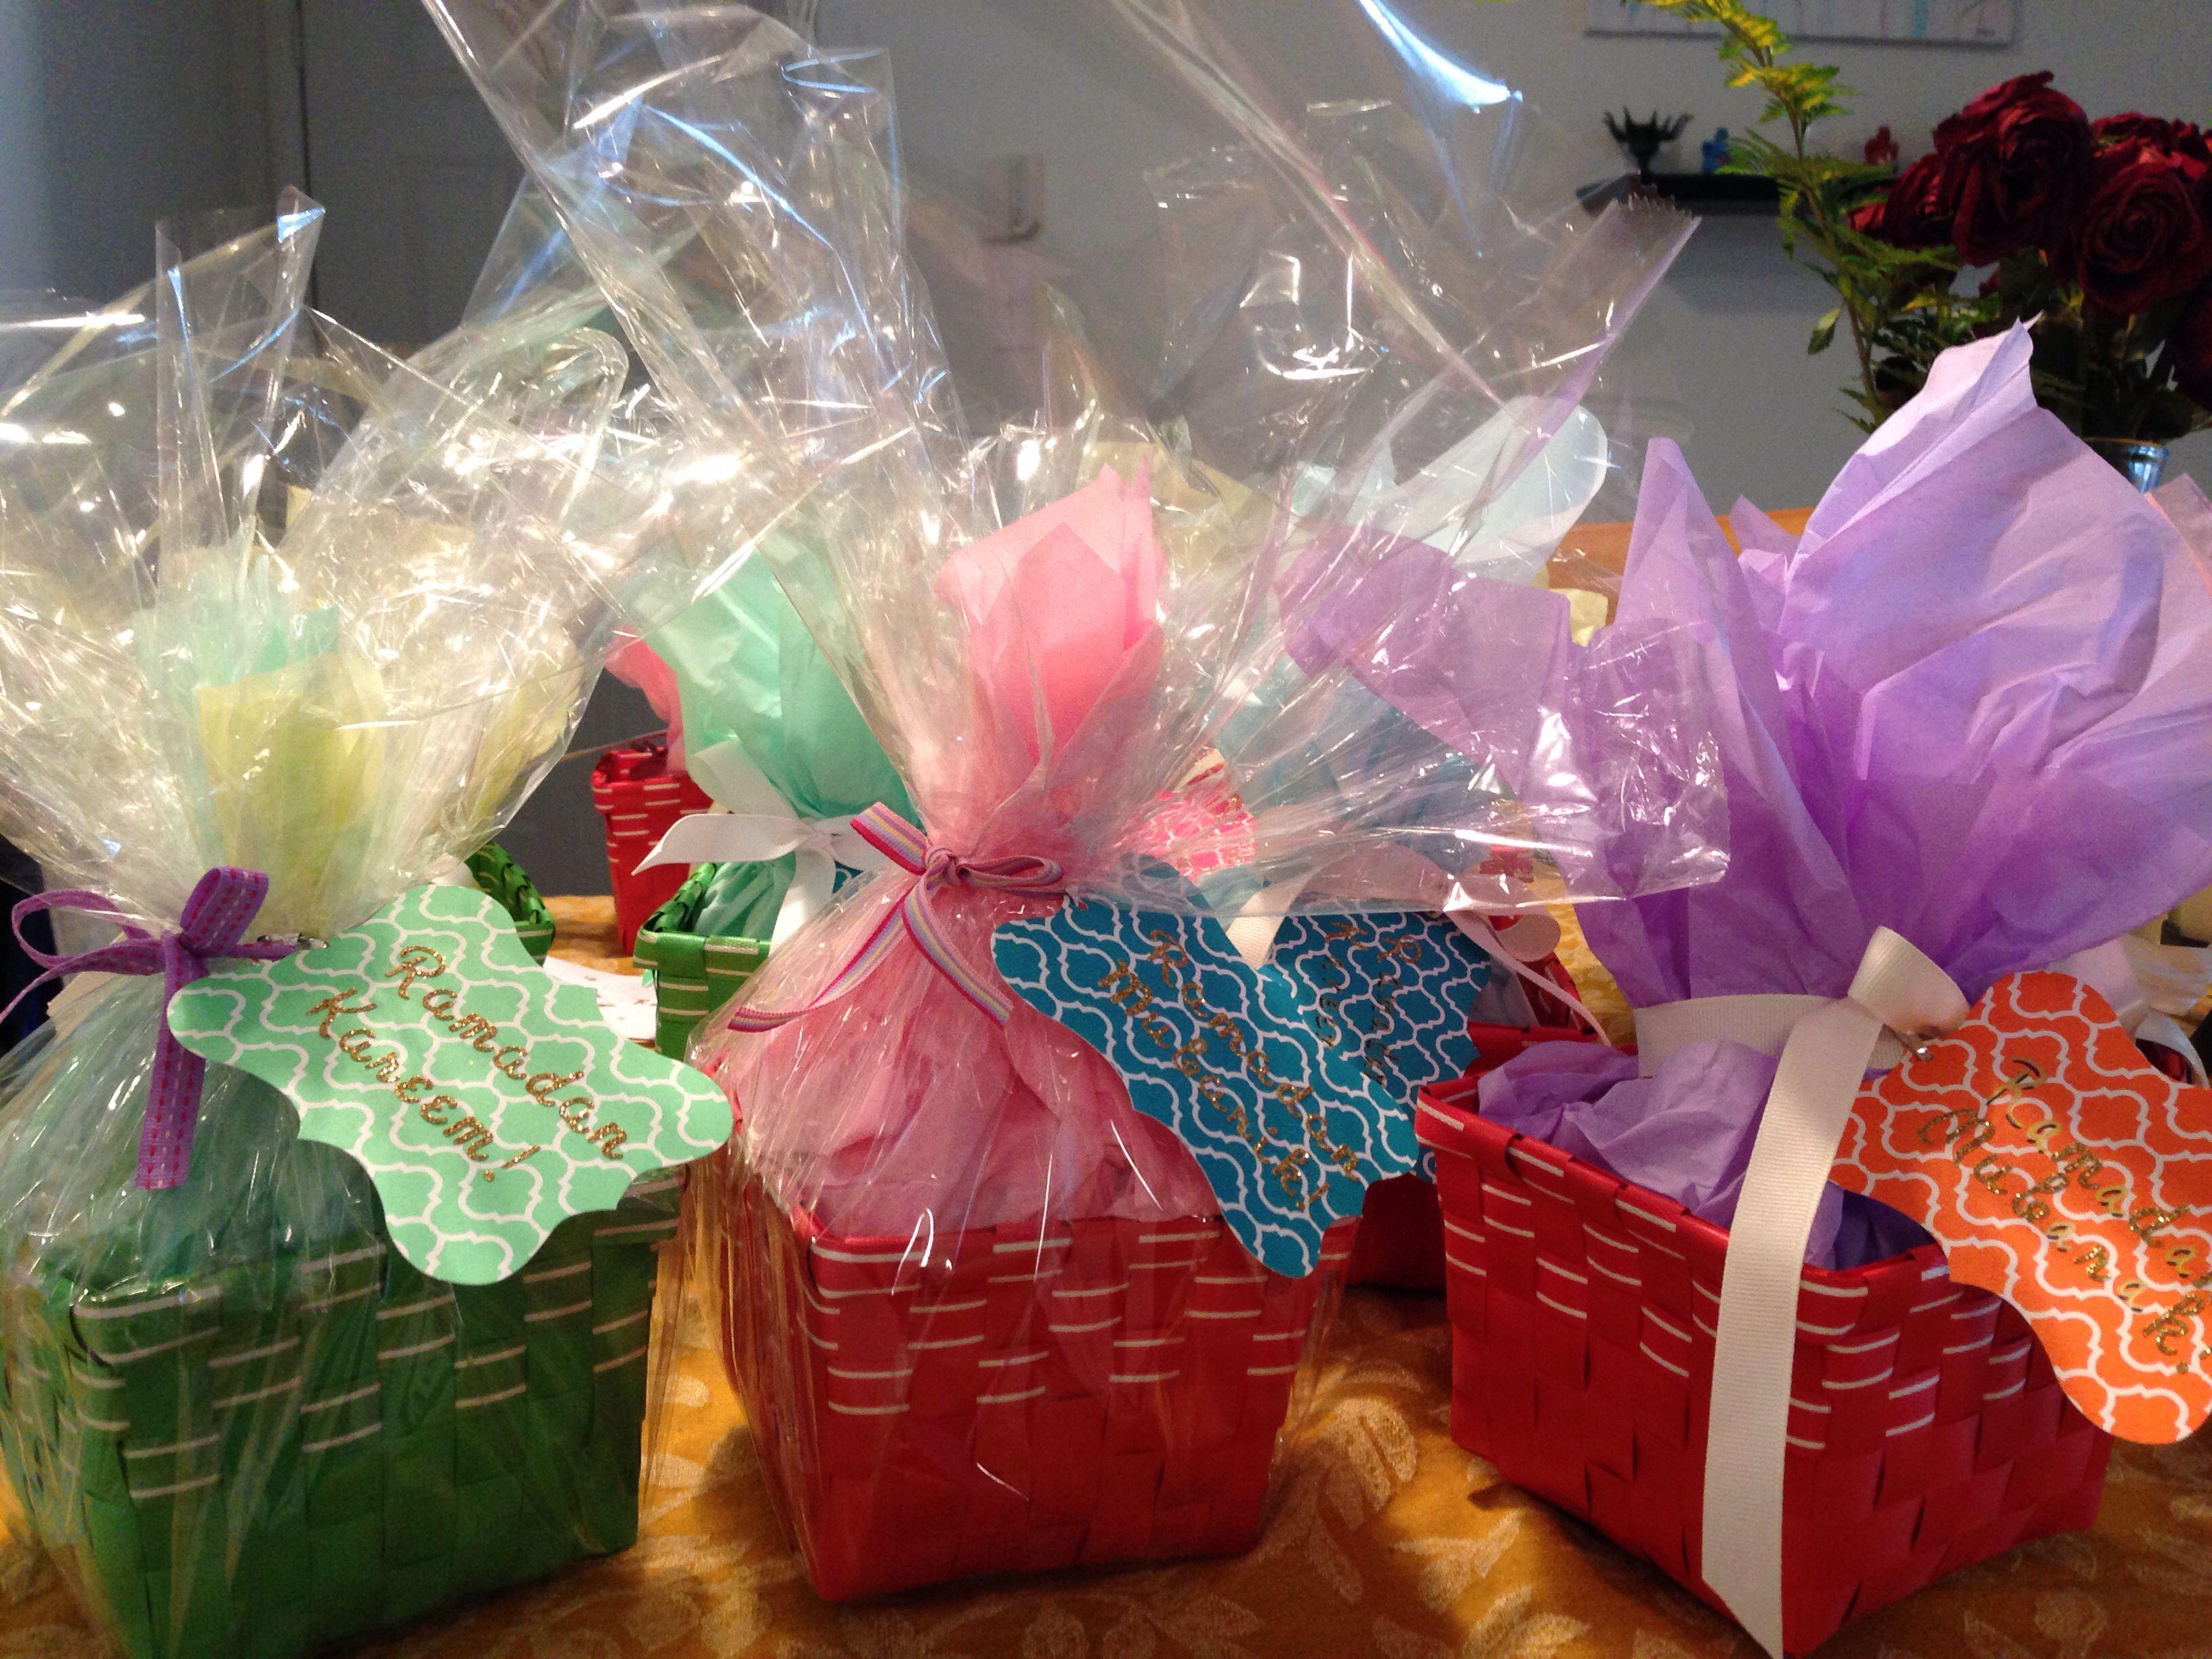 Gift Basket Wrapping Ideas Ramadan Gift Baskets Ramadan Eid Ideas Pinterest Ramadan